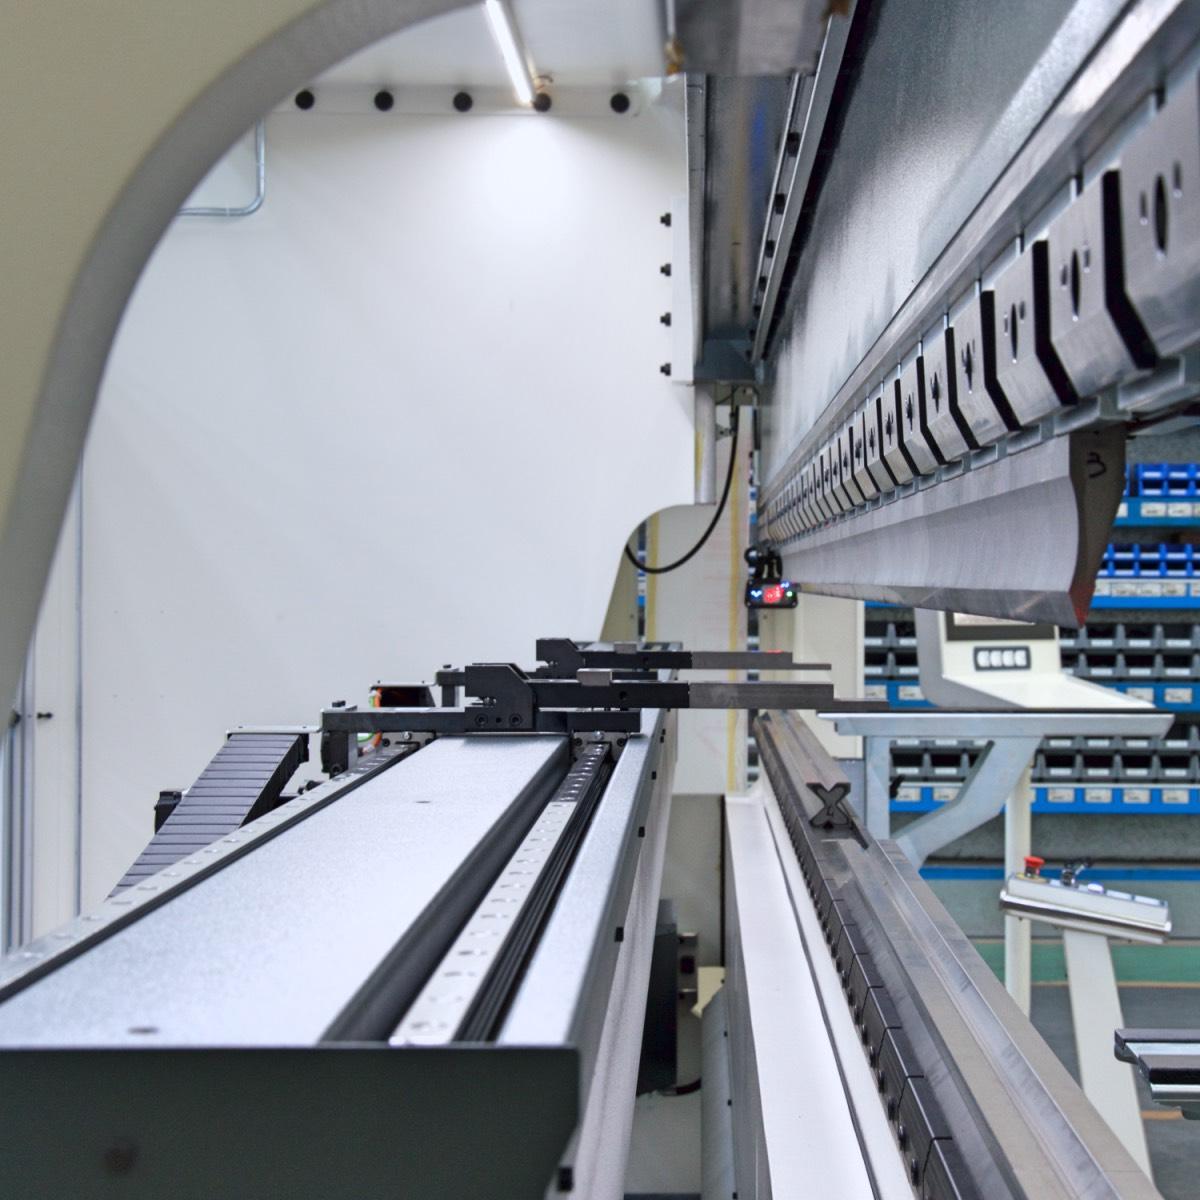 prensa plegadora grandes dimensiones tope trasero